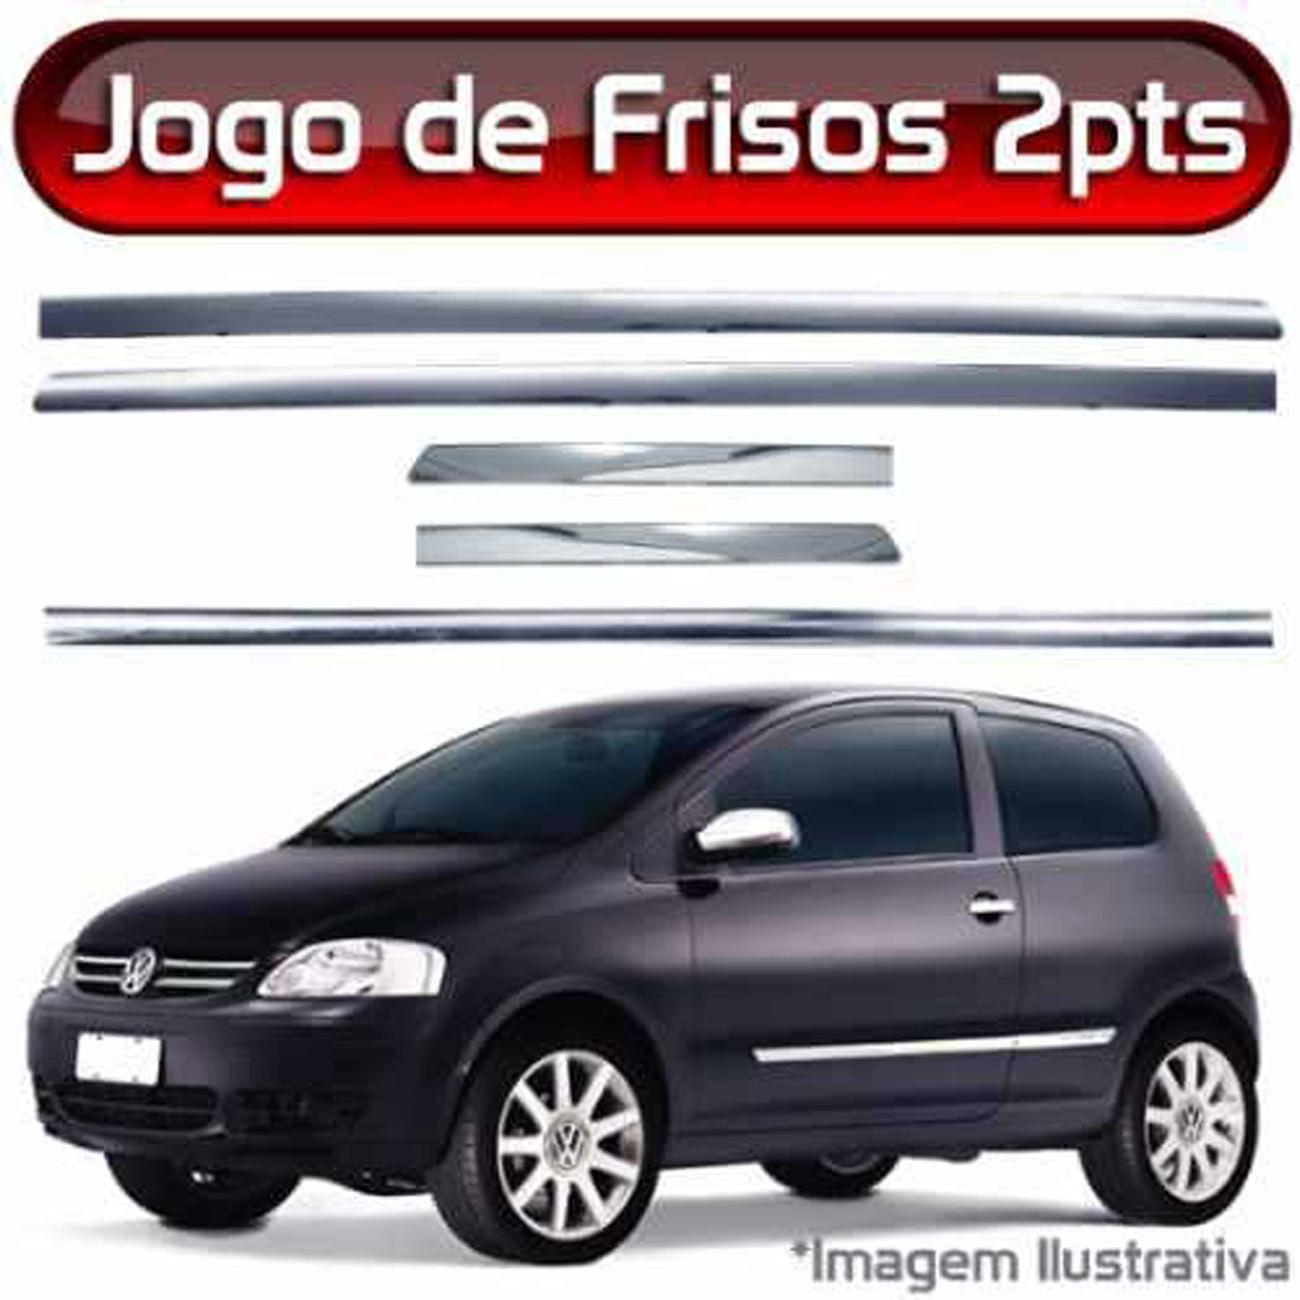 Friso Cromado Gol Palio Ka Peugeot 206 Clio Fusca 2 Portas